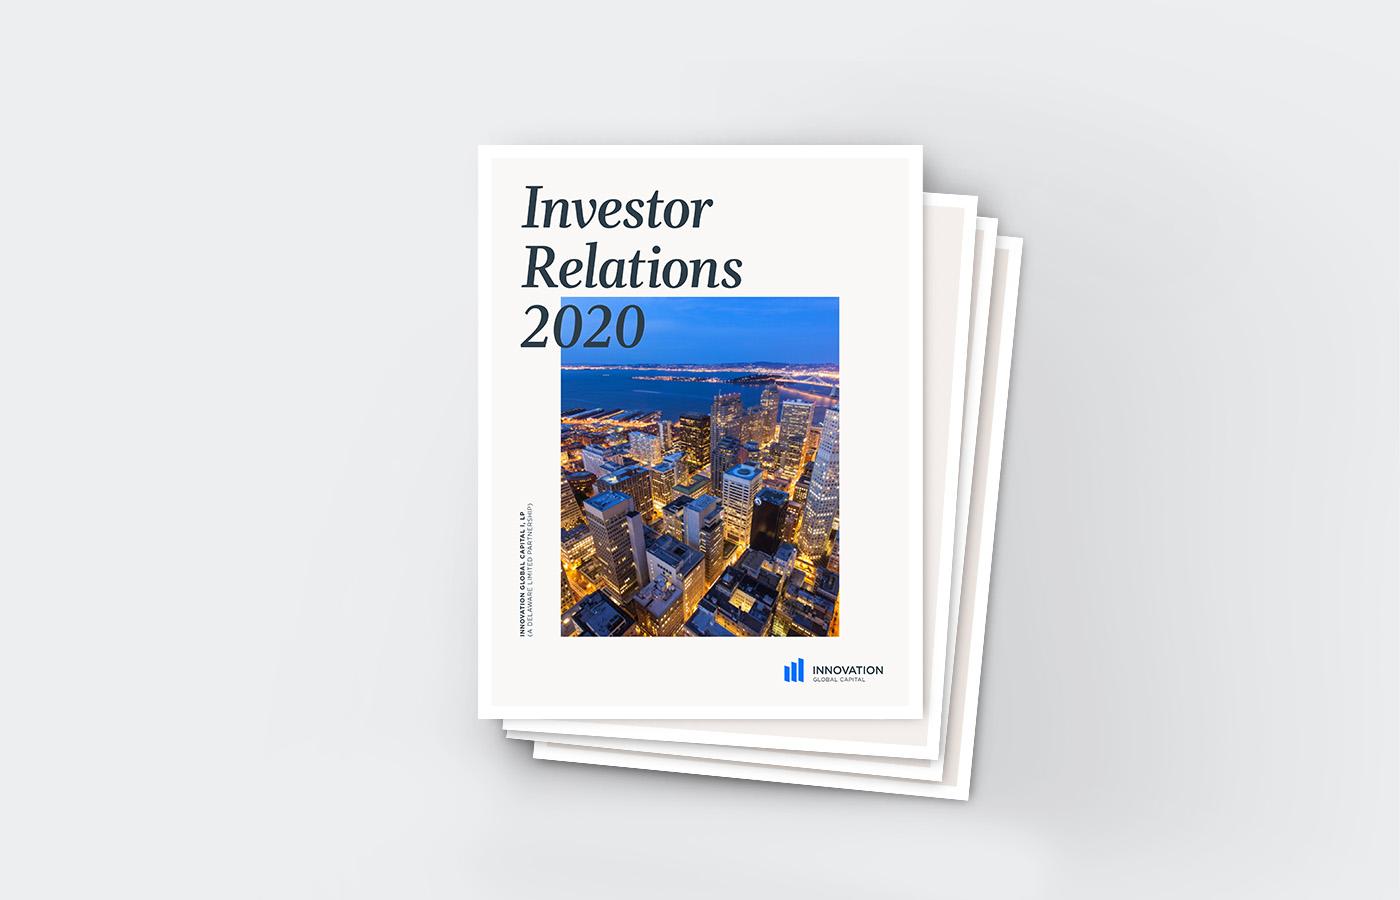 Innovation Global Investor Relations document